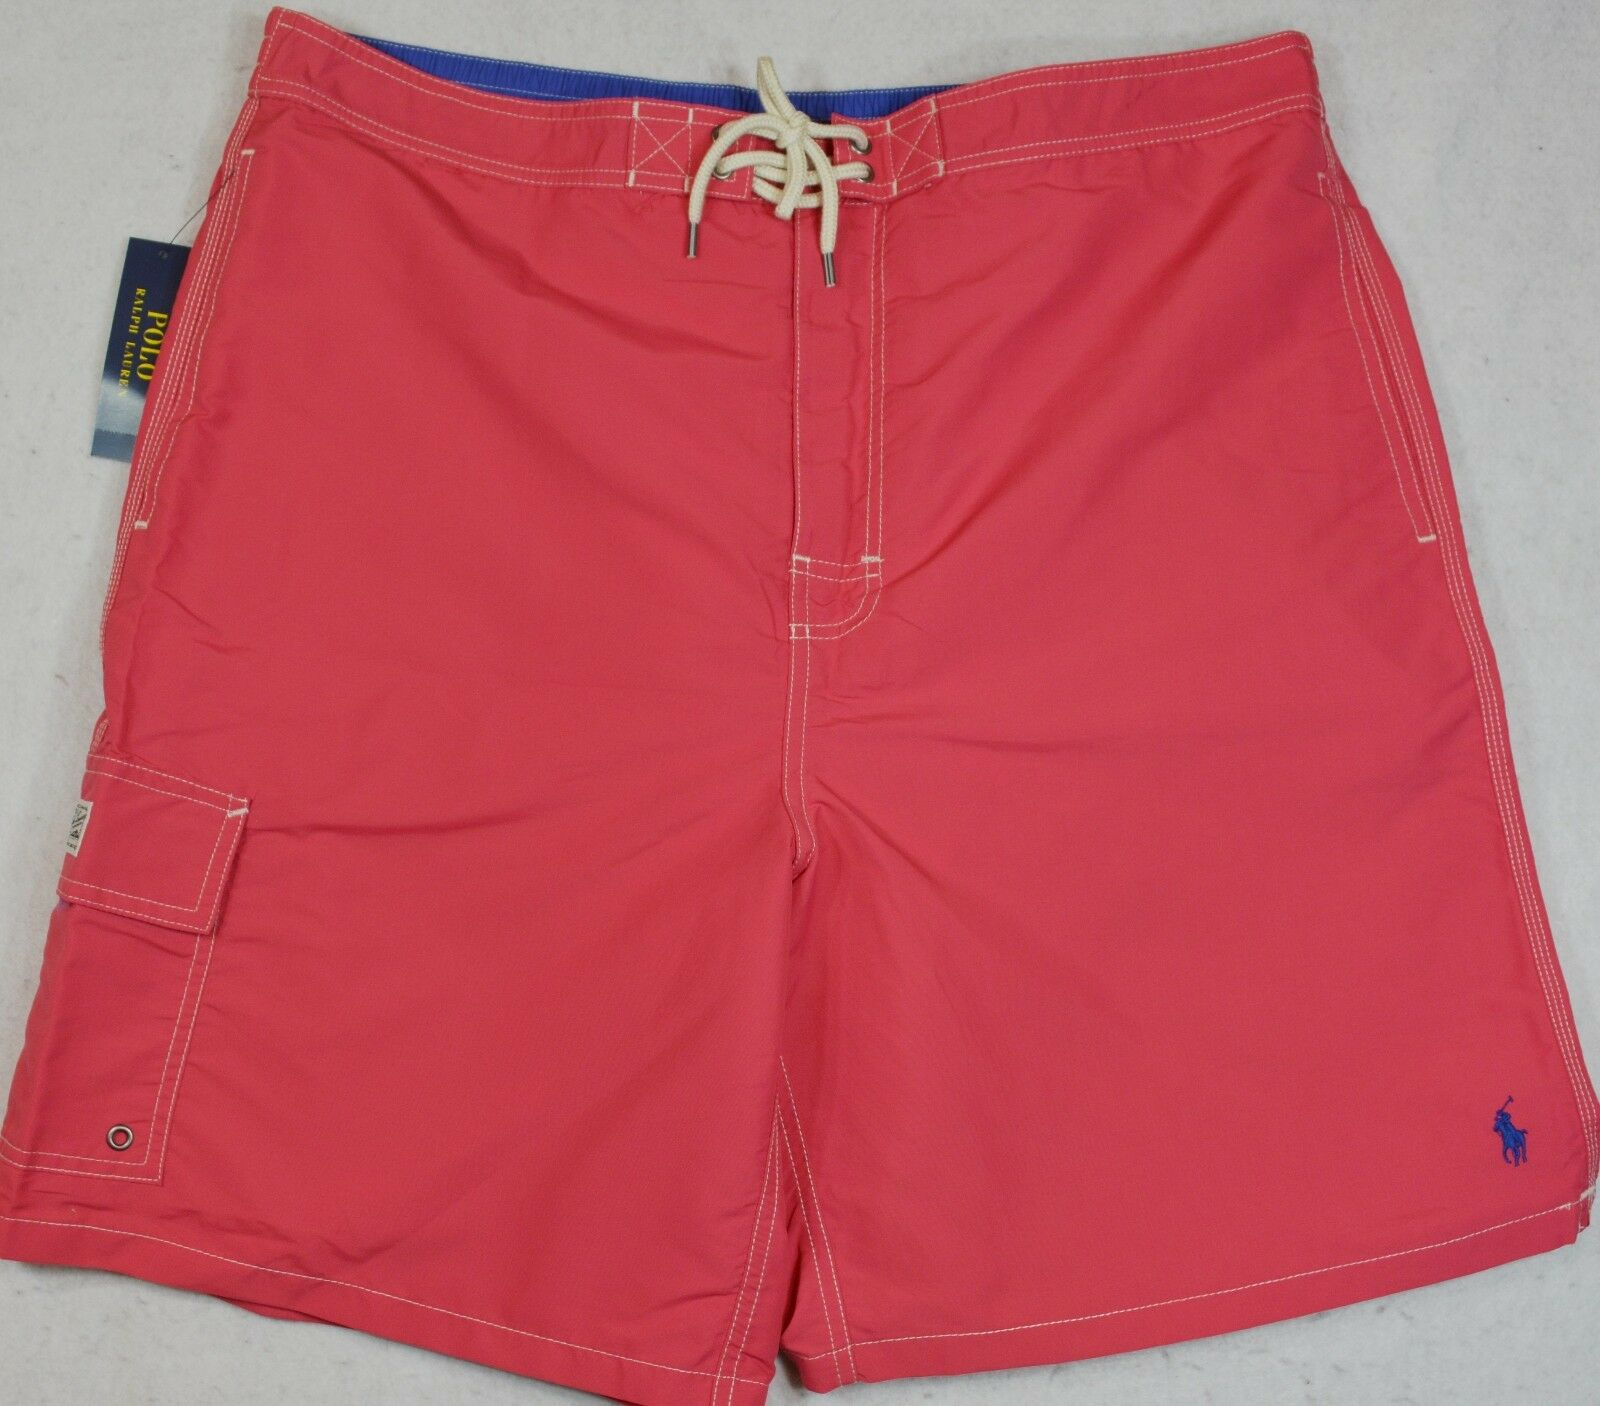 d890a4fa32eb5 Polo Ralph Lauren Swim Trunks Board Pink 4XB 4XL 4X NWT Shorts Tropical  nvkvgr822-Swimwear